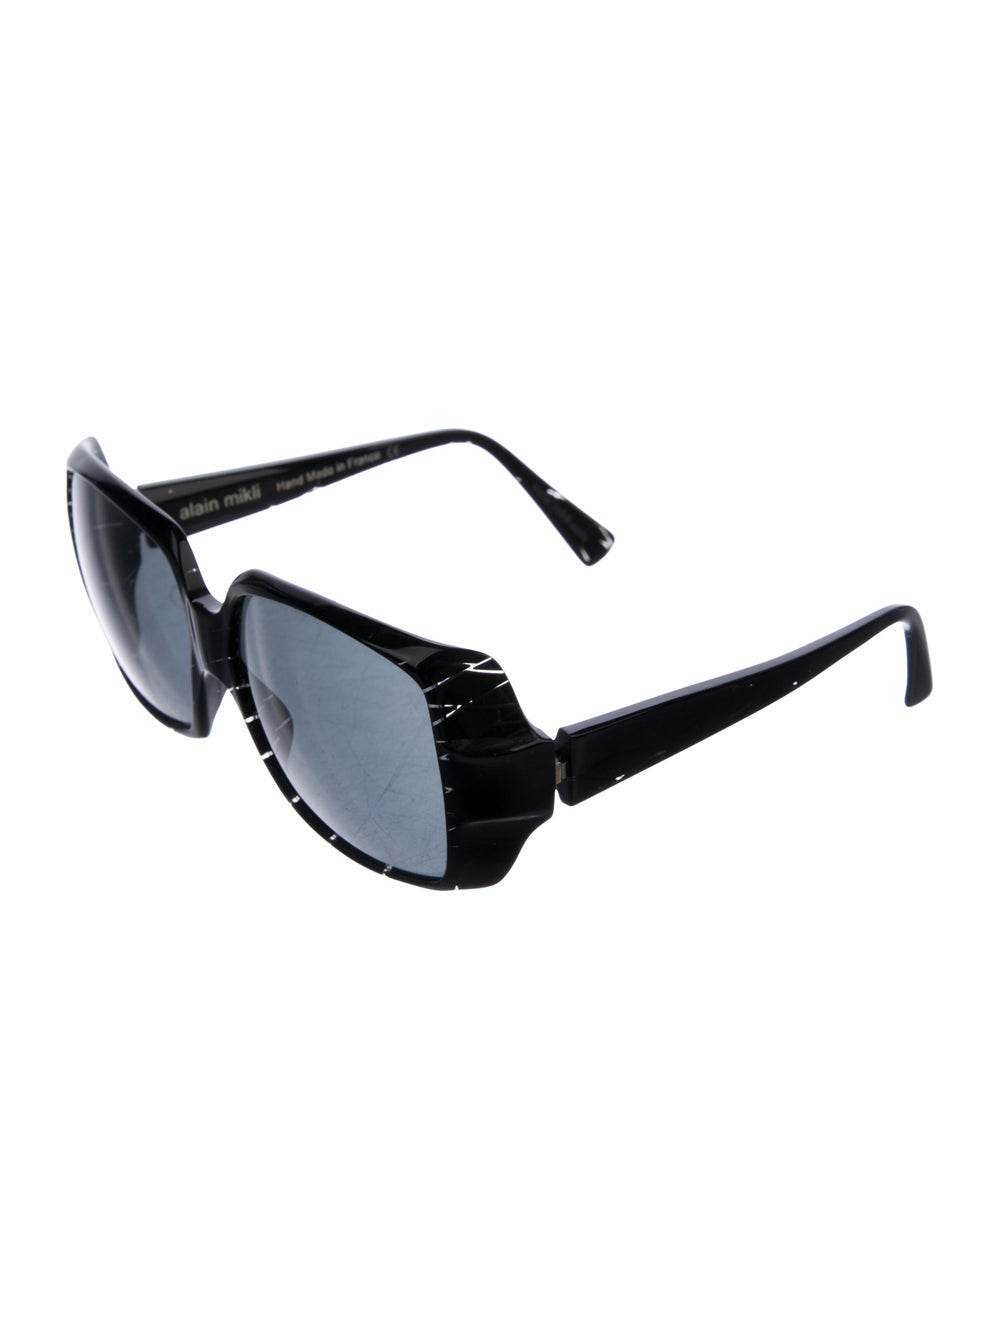 Alain Mikli Tinted Square Sunglasses Black - image 2